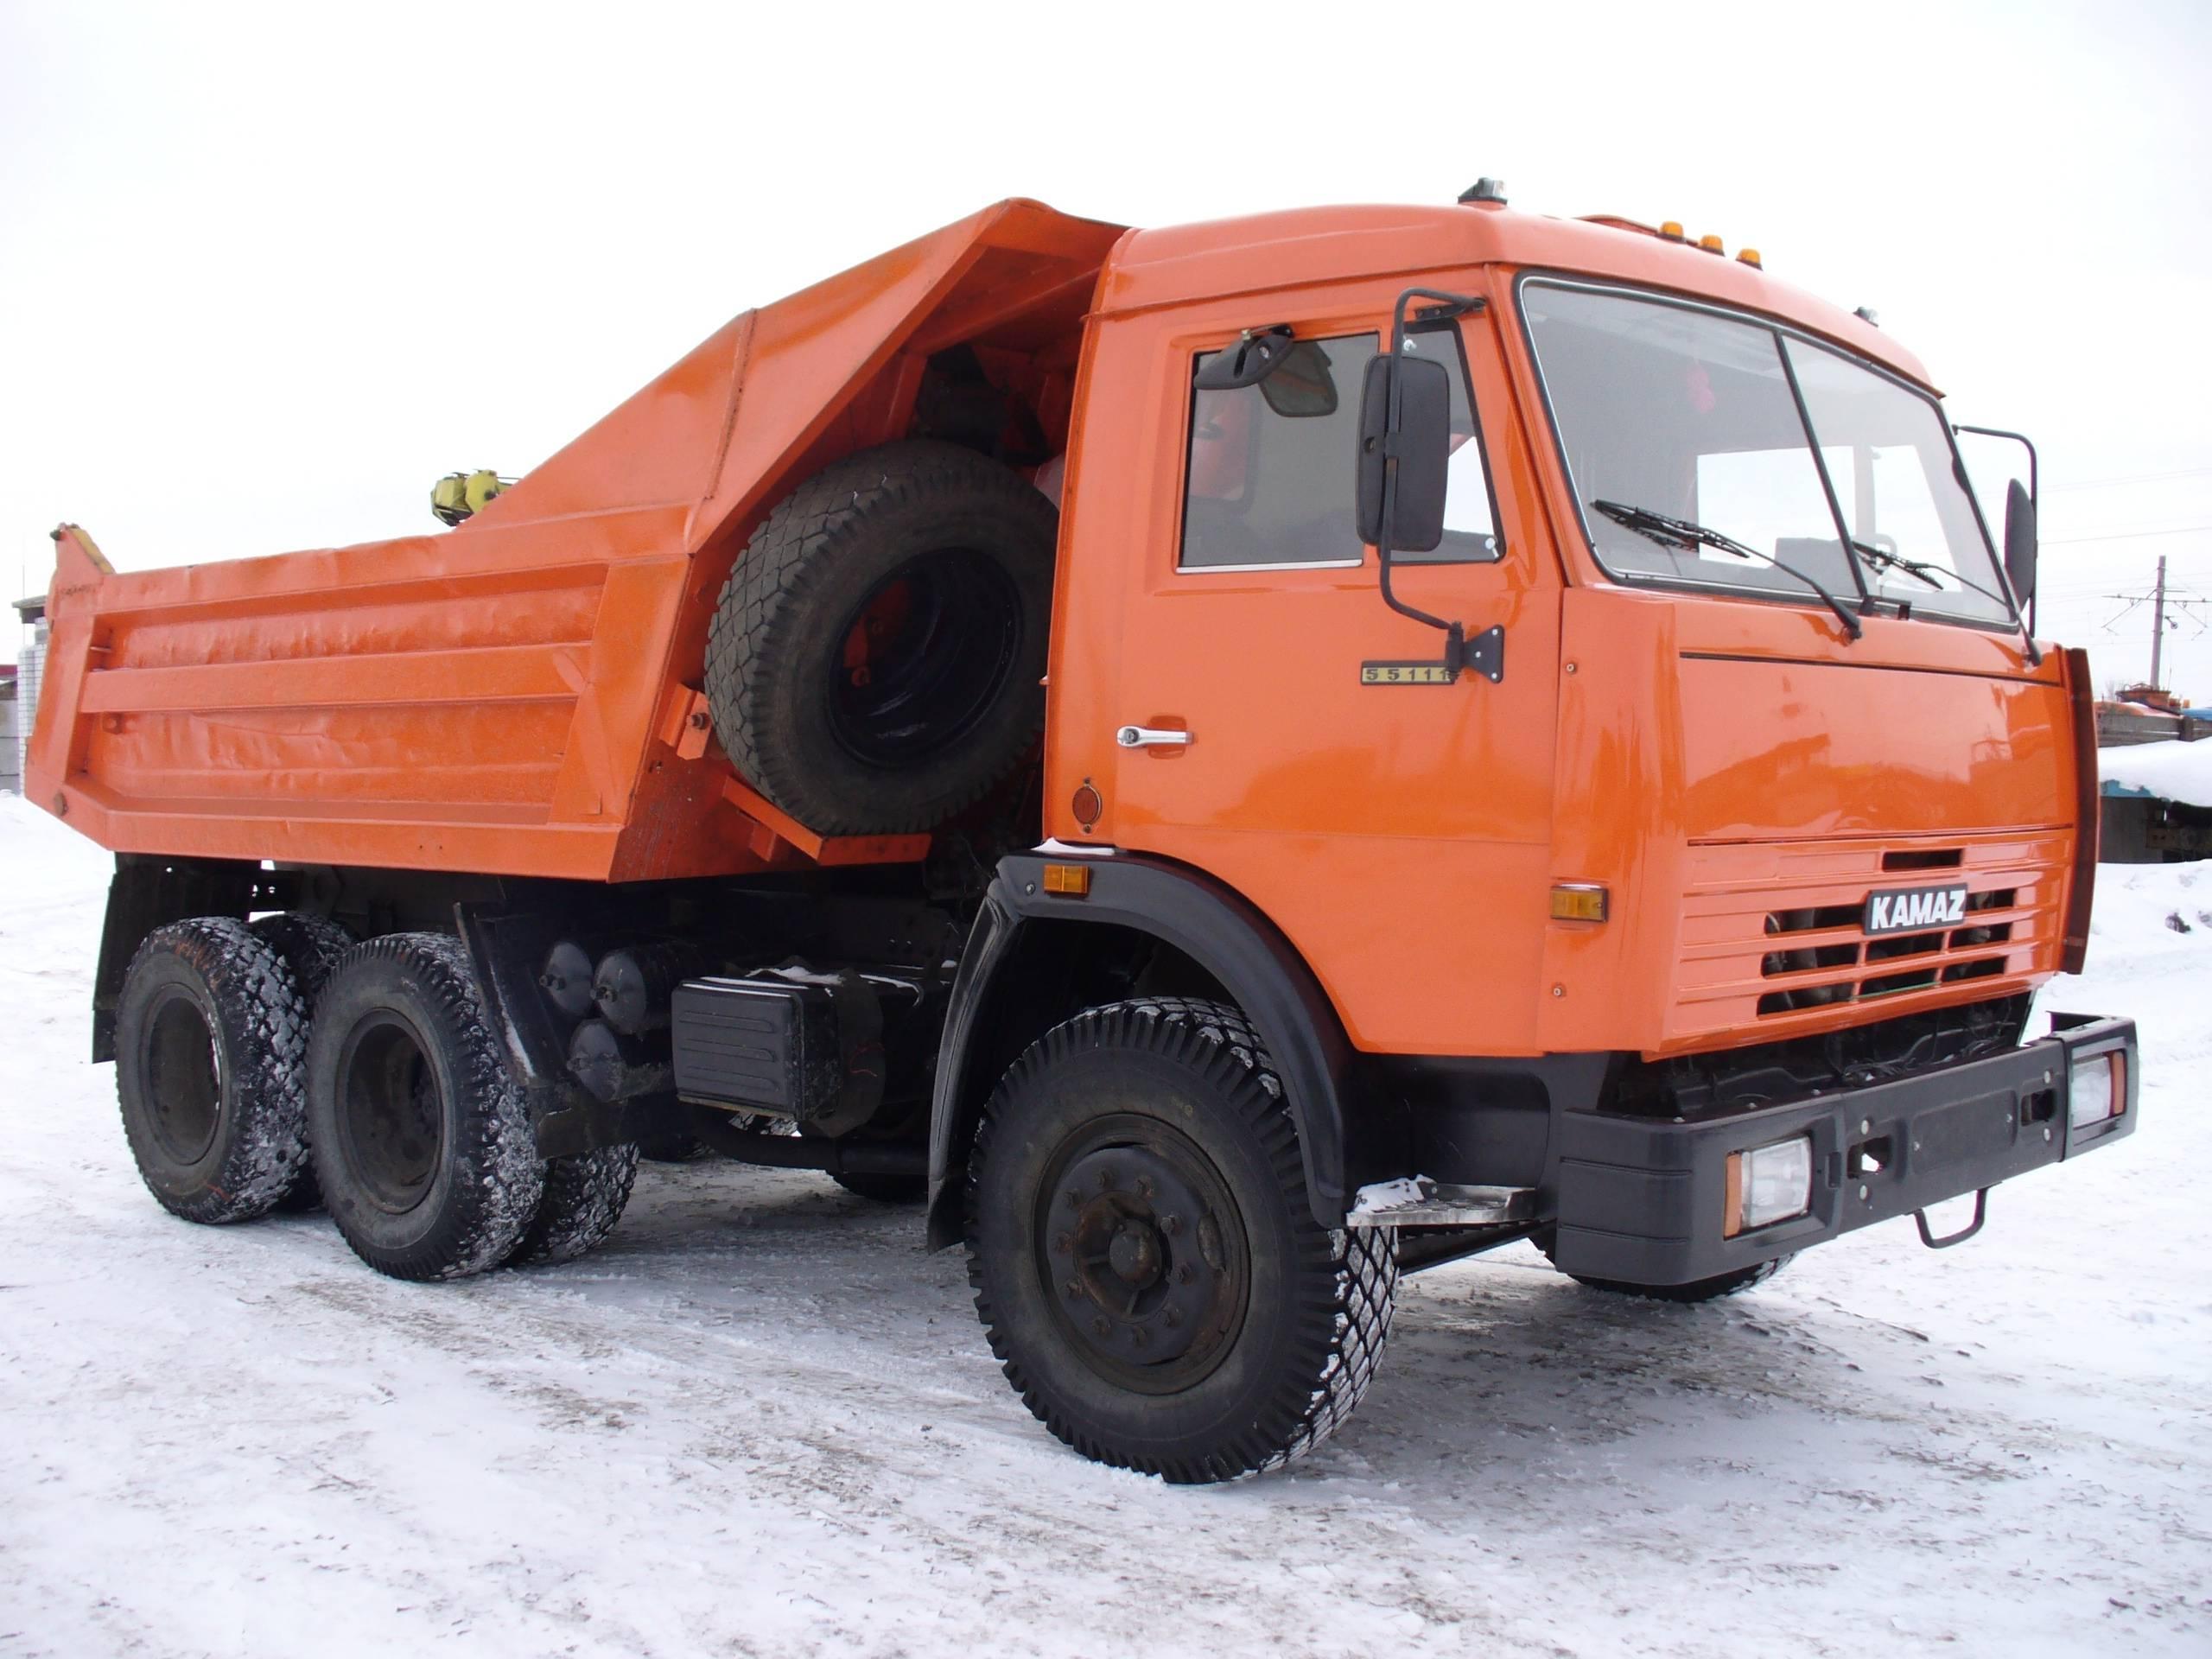 Автомобиль - самосвал Камаз